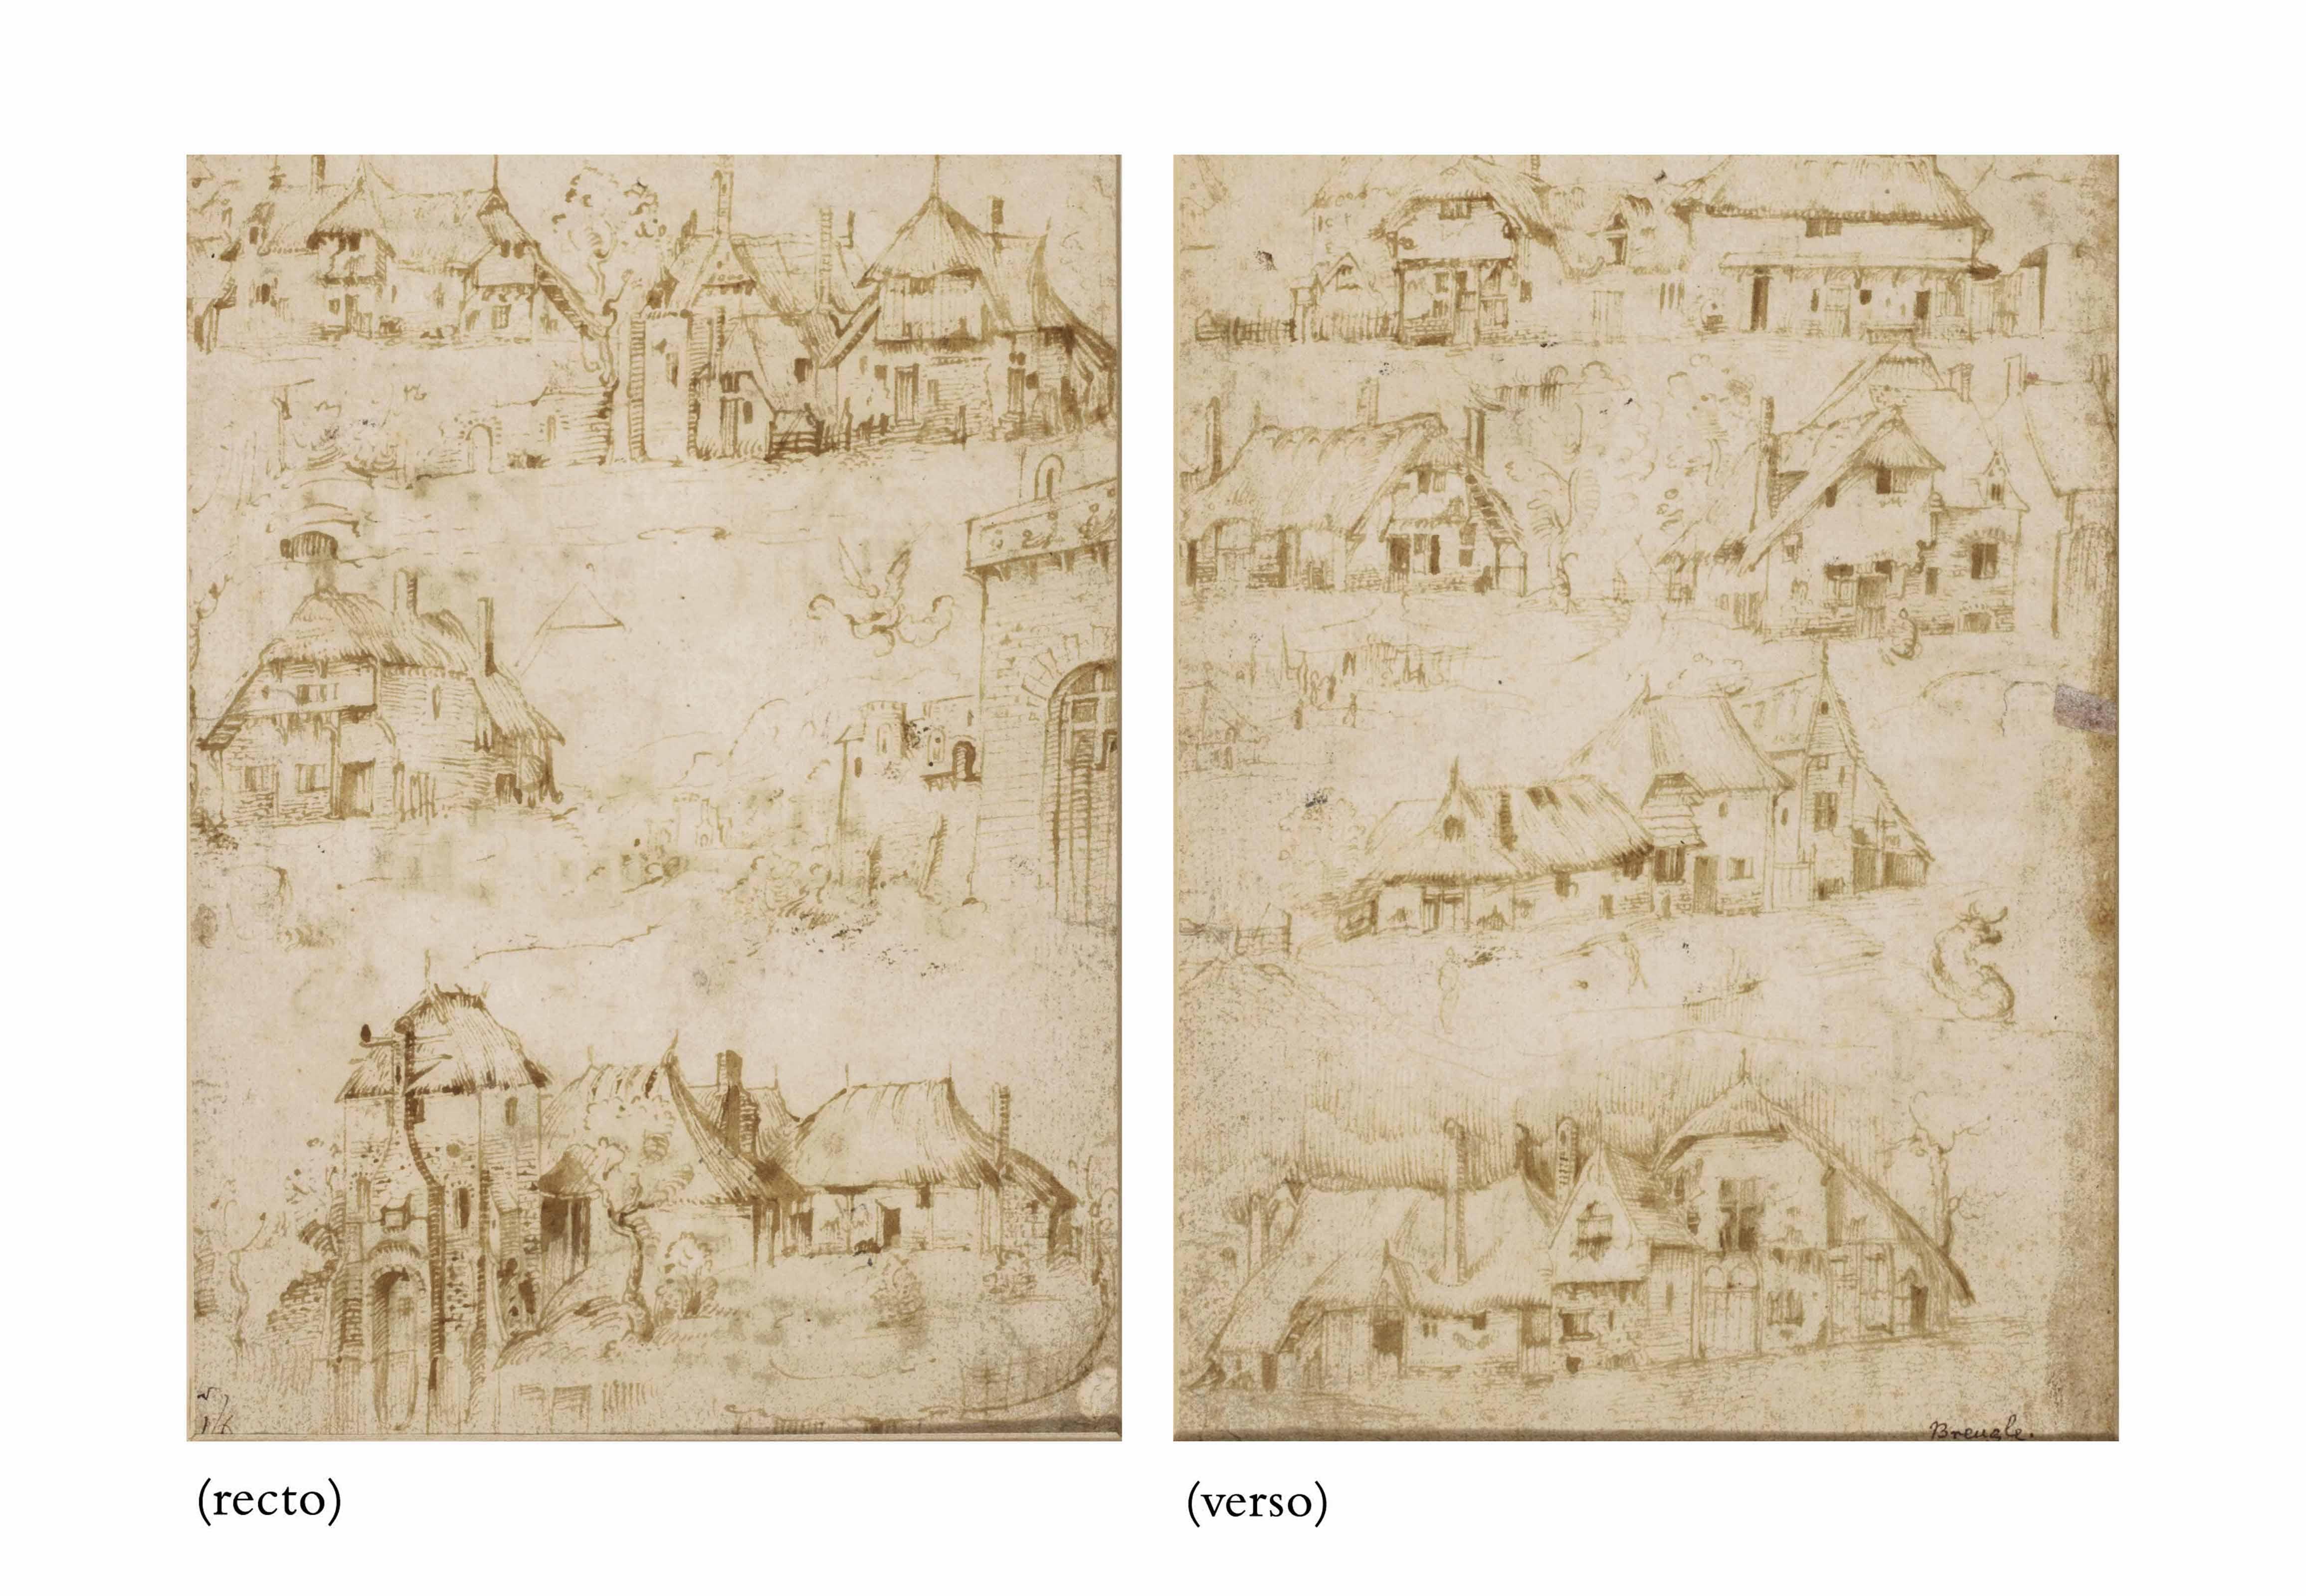 Flemish School, early 16th Century